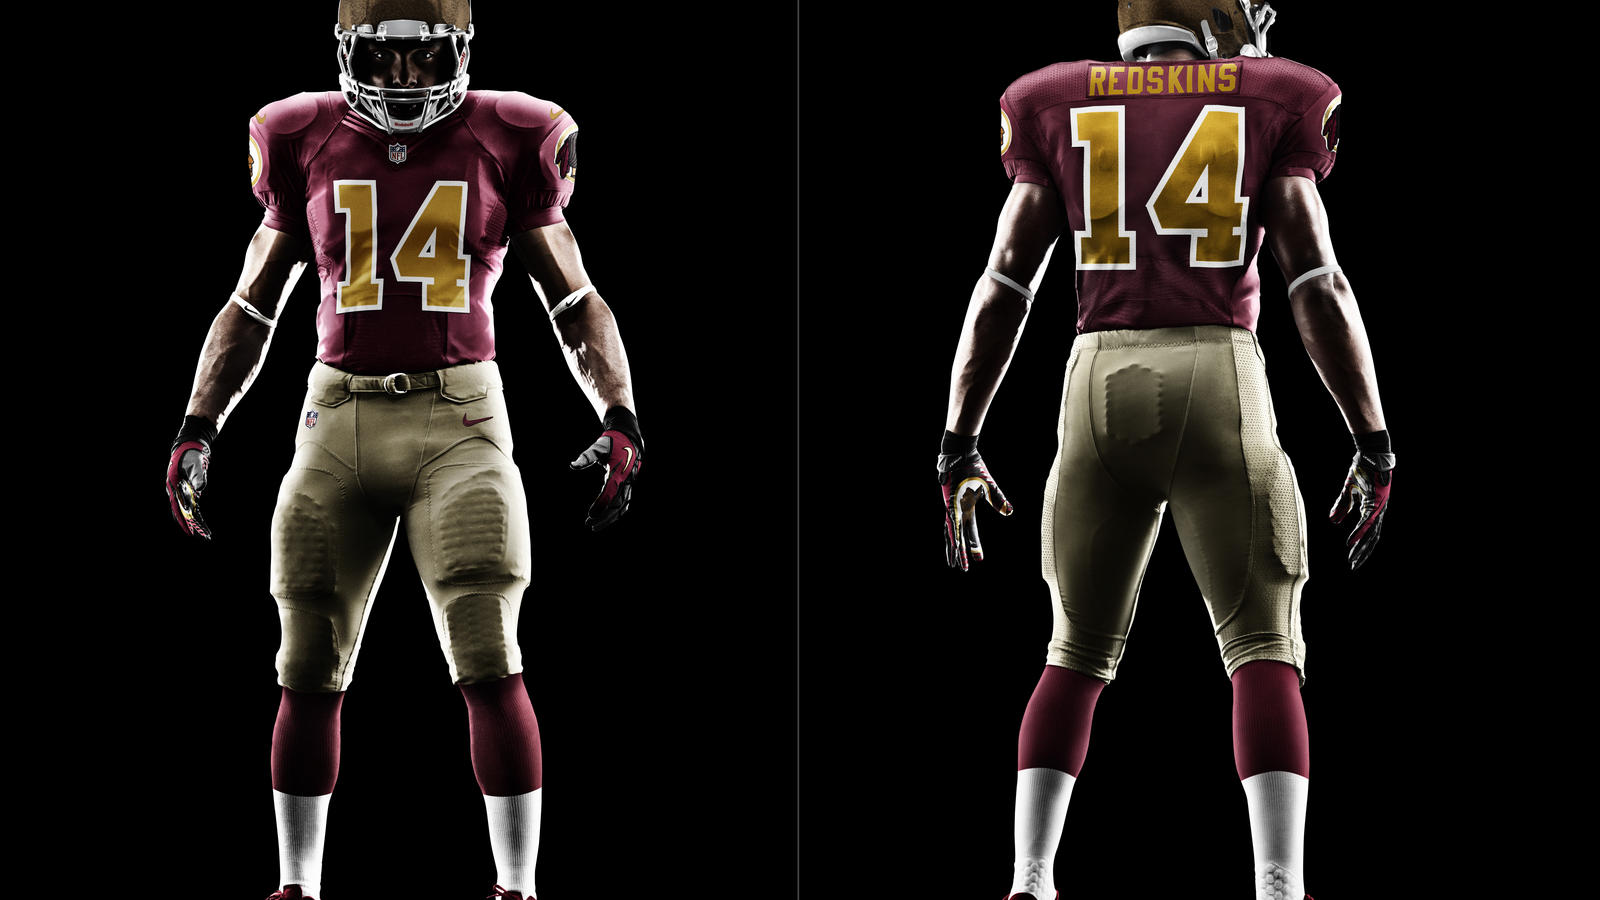 reputable site a79c7 23eb8 Washington Redskins Unveil New Nike Anniversary Uniform ...